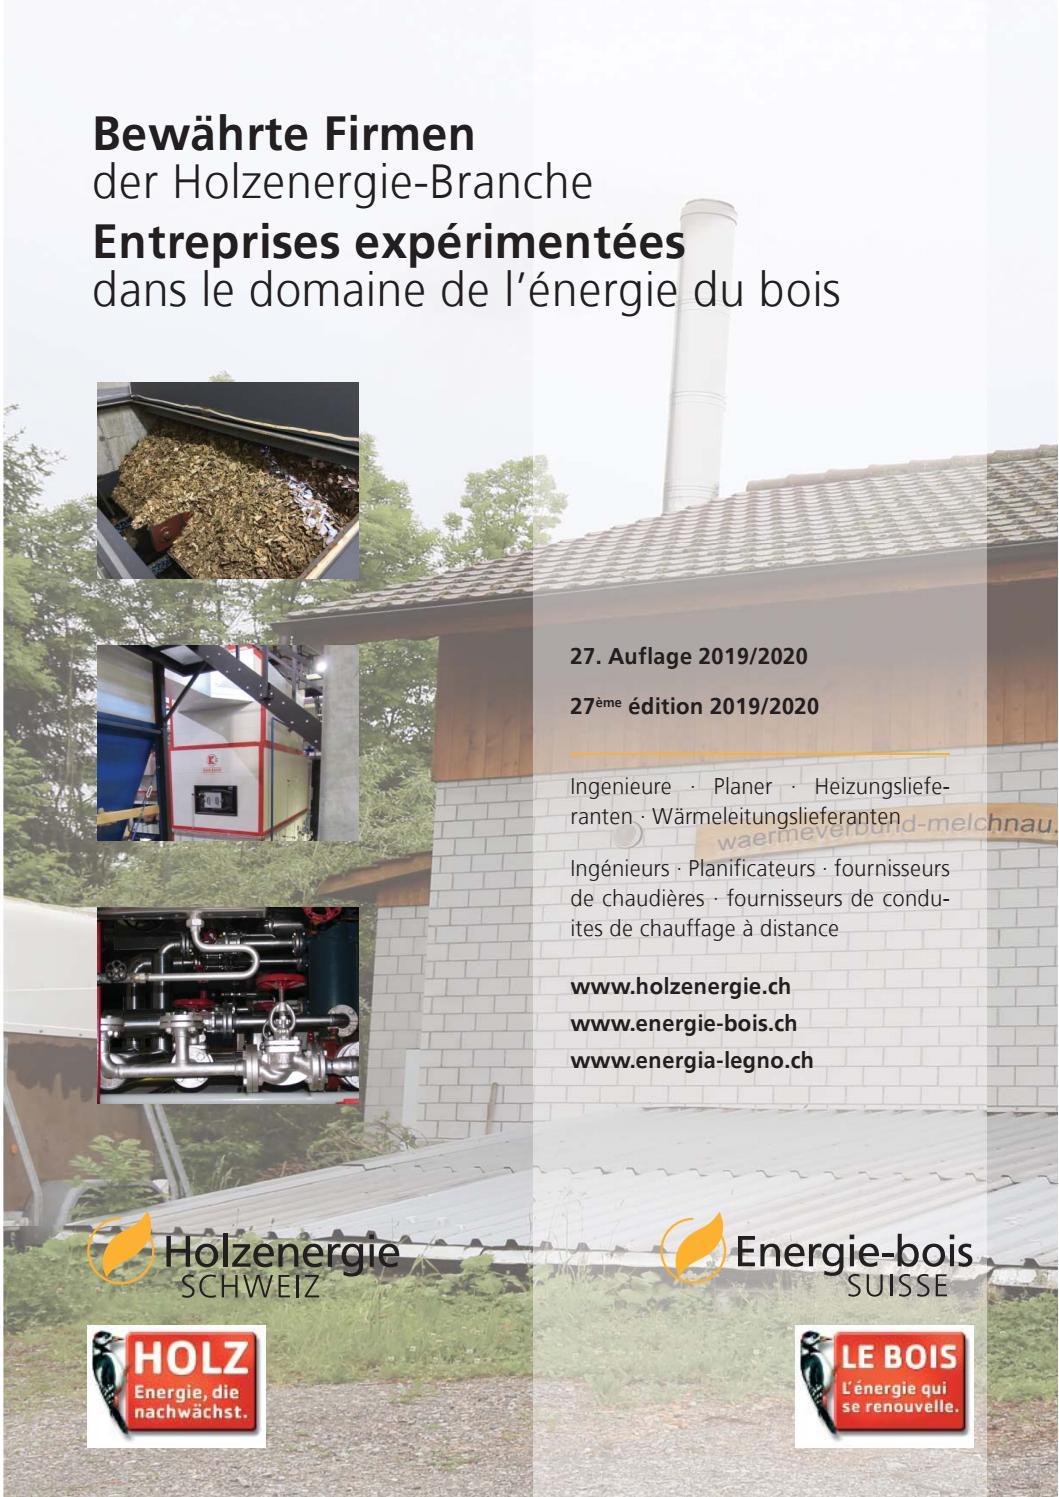 Bewährte Firmen by Energie-bois Suisse - issuu